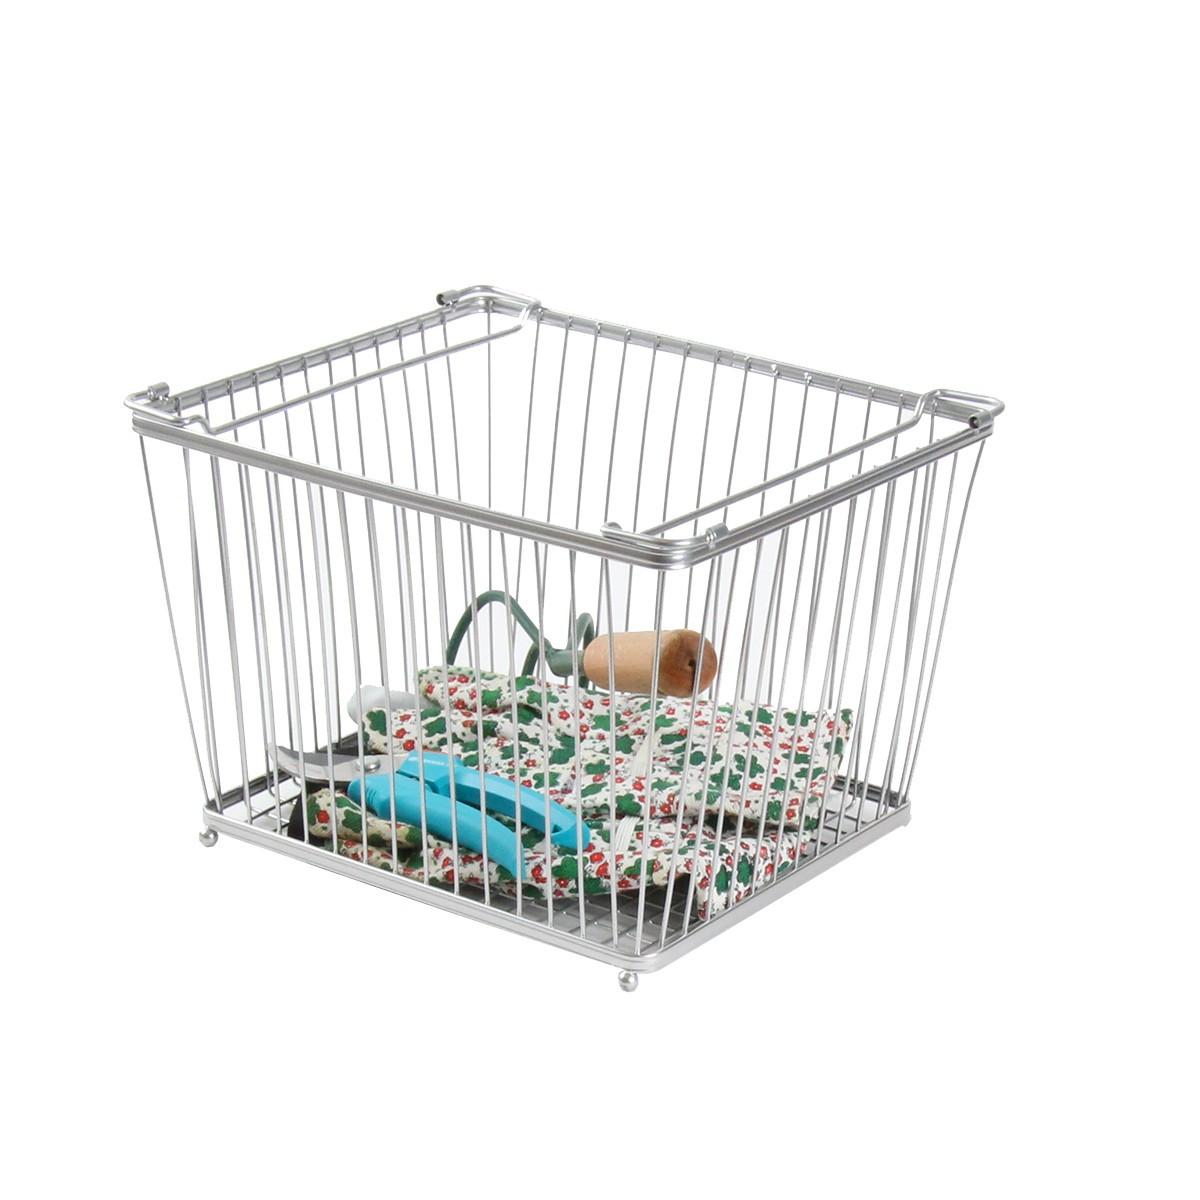 panier m tallique rangement coin jardin. Black Bedroom Furniture Sets. Home Design Ideas